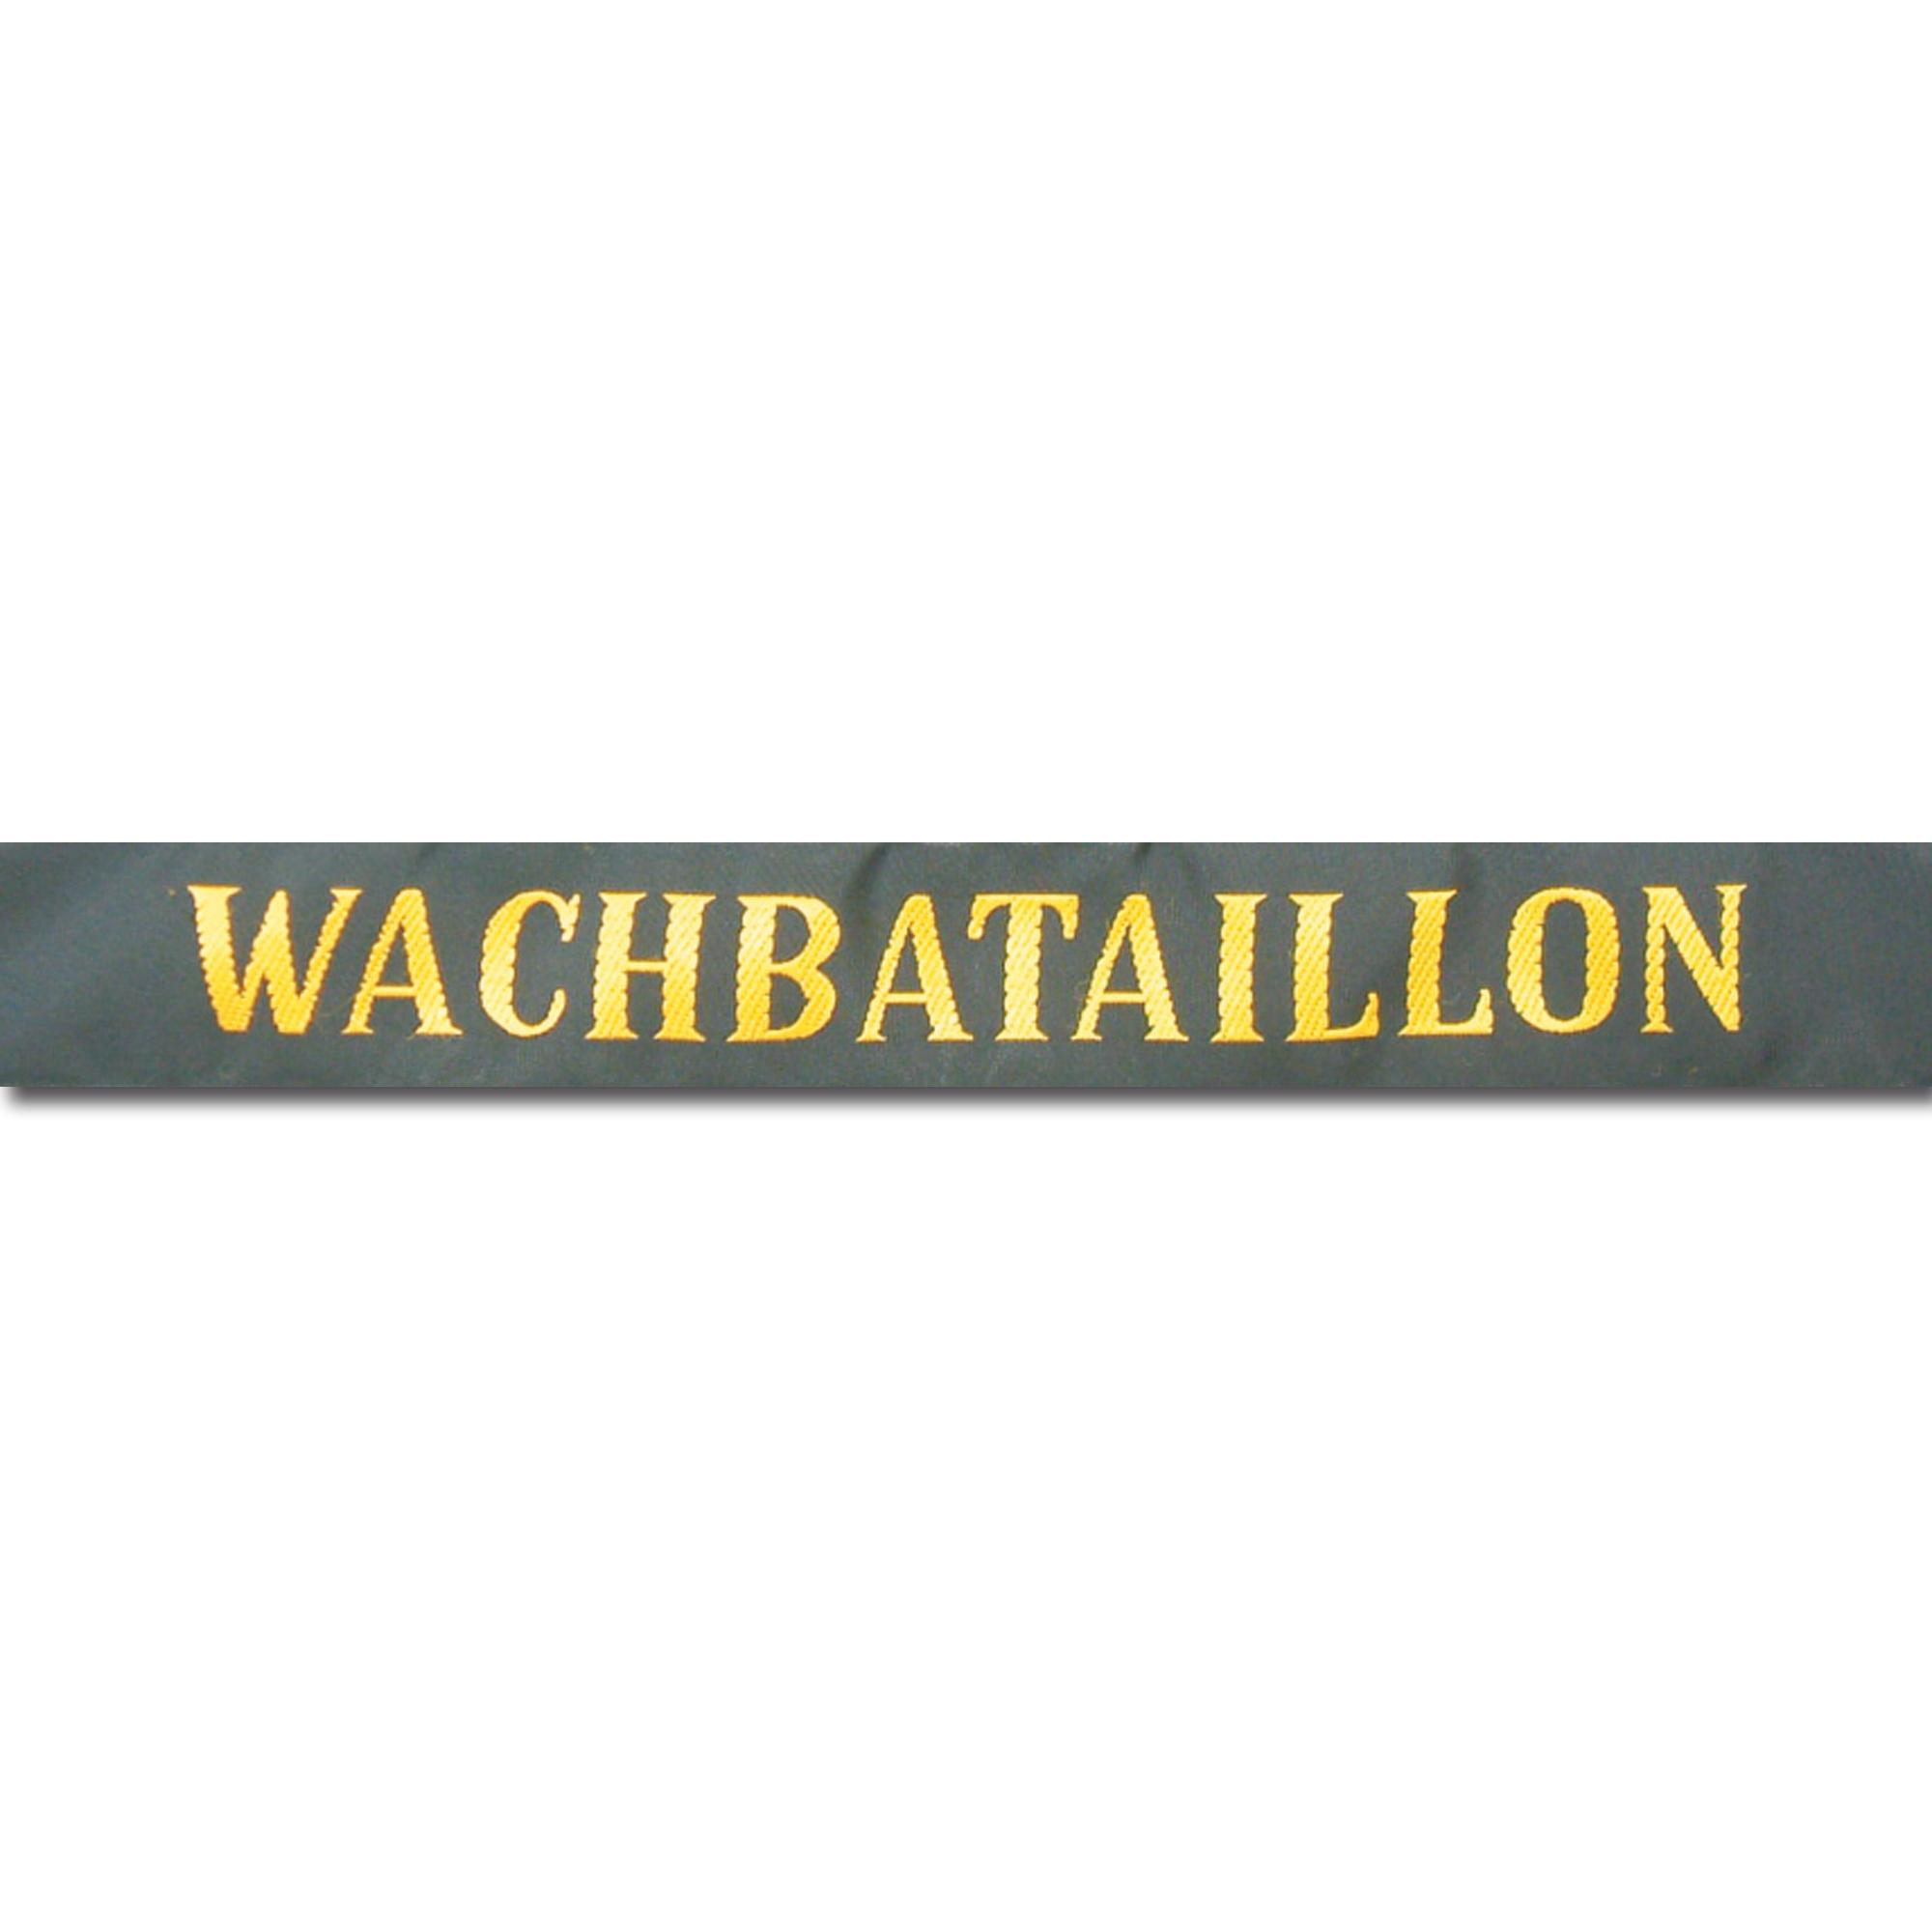 Hat Band German Navy Wachbataillon